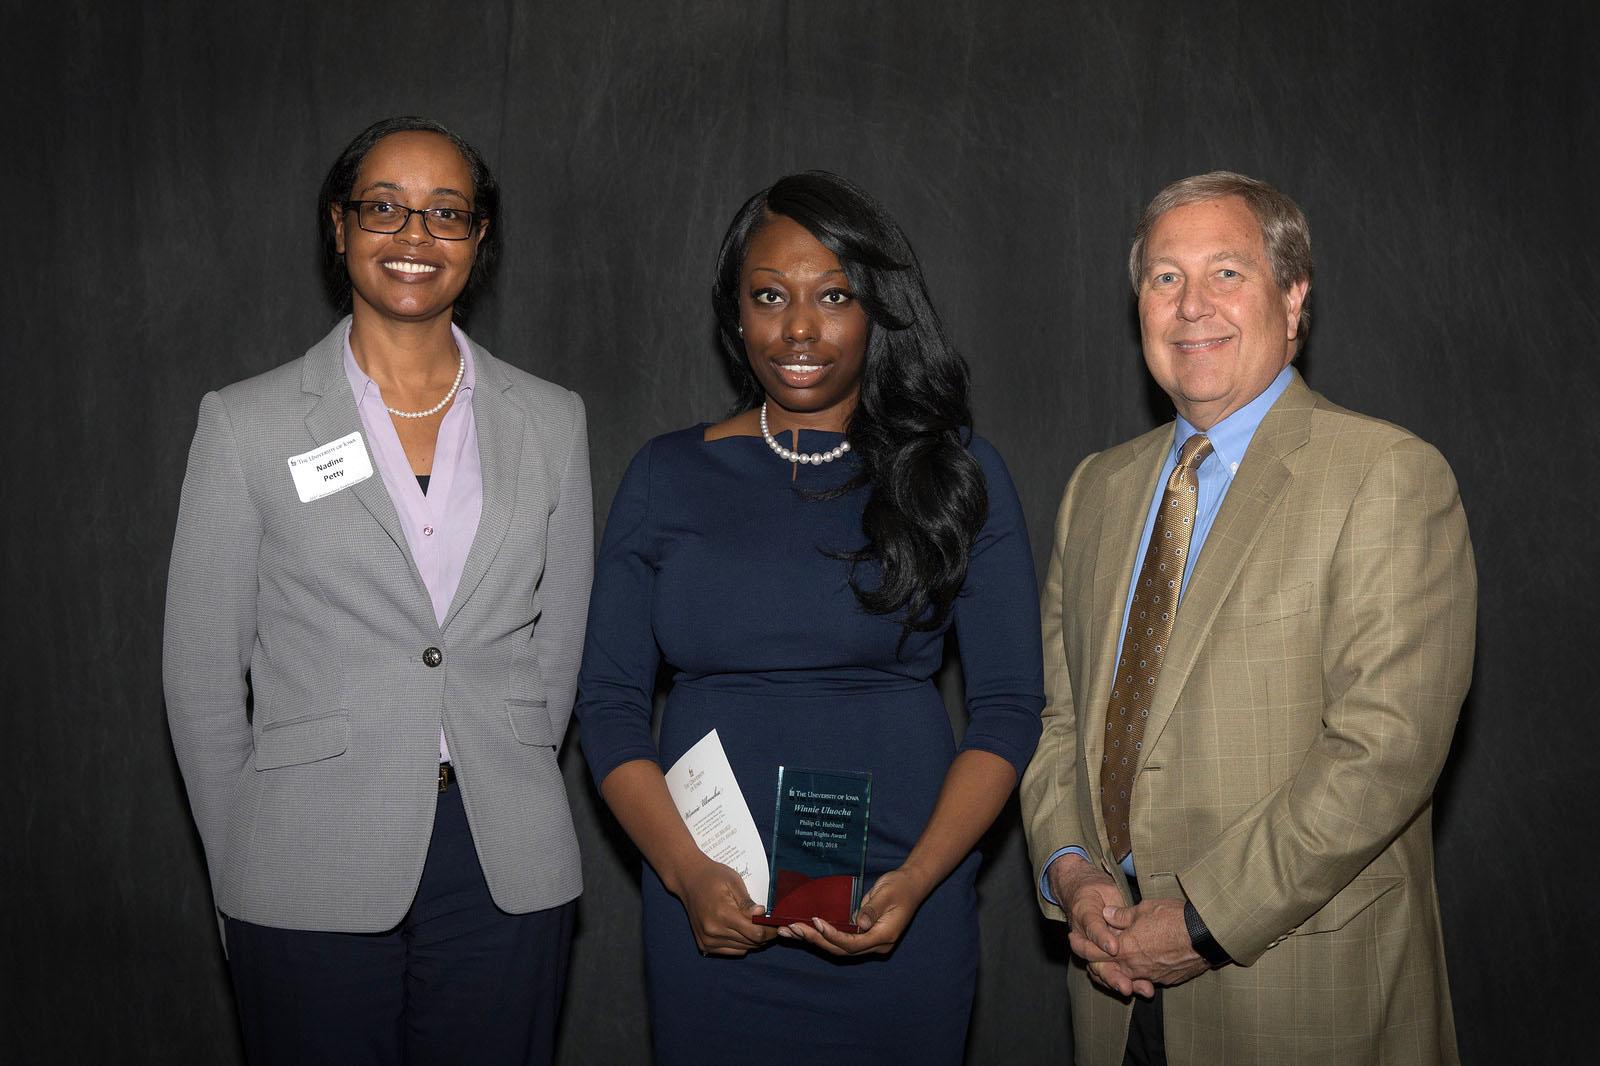 Winnie Uluocha receives the 2018 Hubbard Award